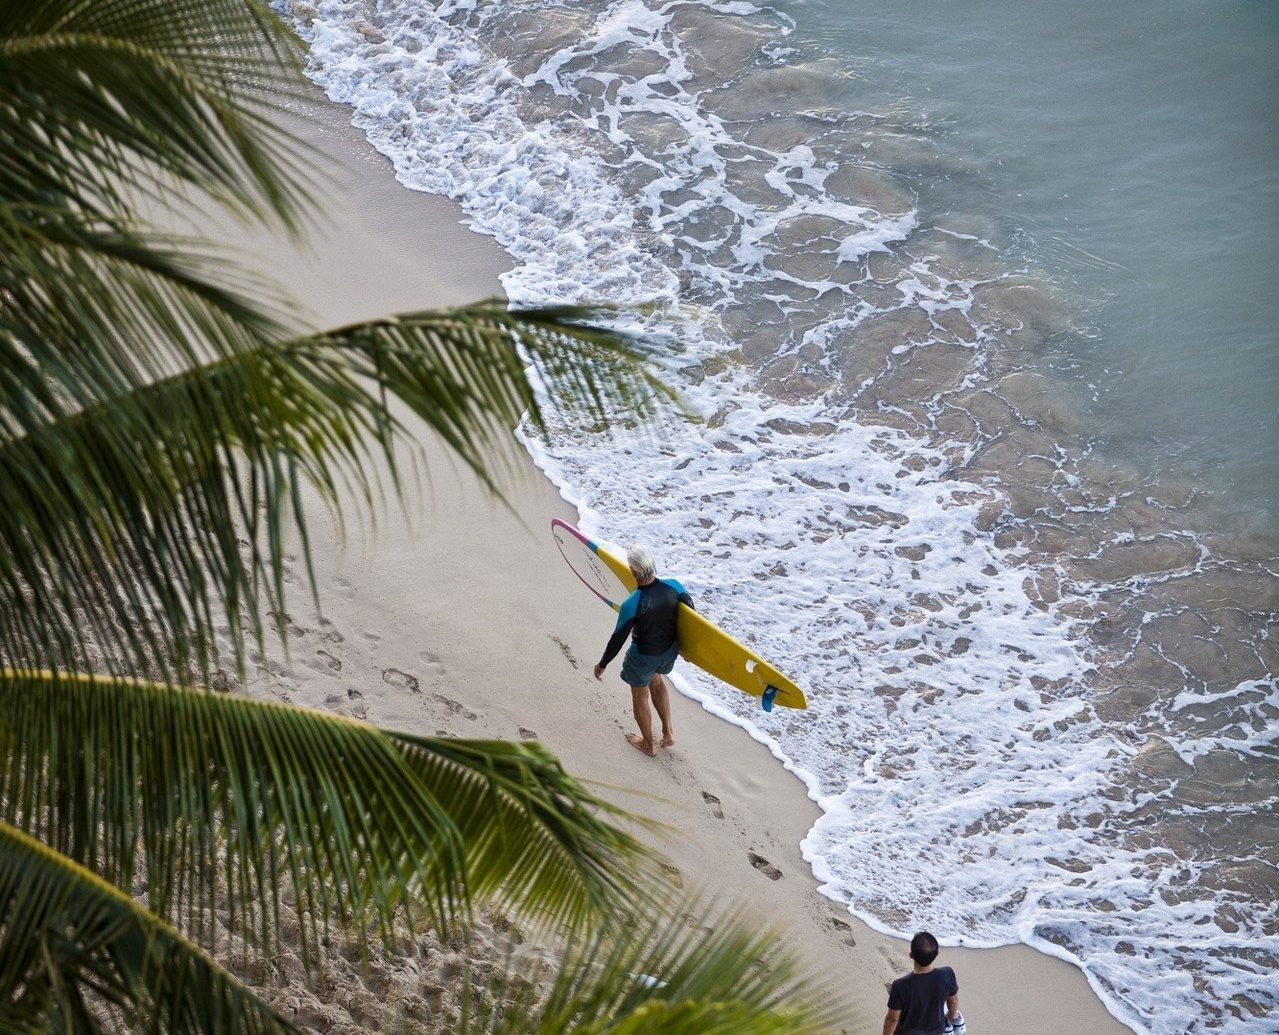 Trip Ideas water outdoor Beach shore Sea body of water Coast Ocean water sport vacation wave arecales sunlight sand bay tropics surfing